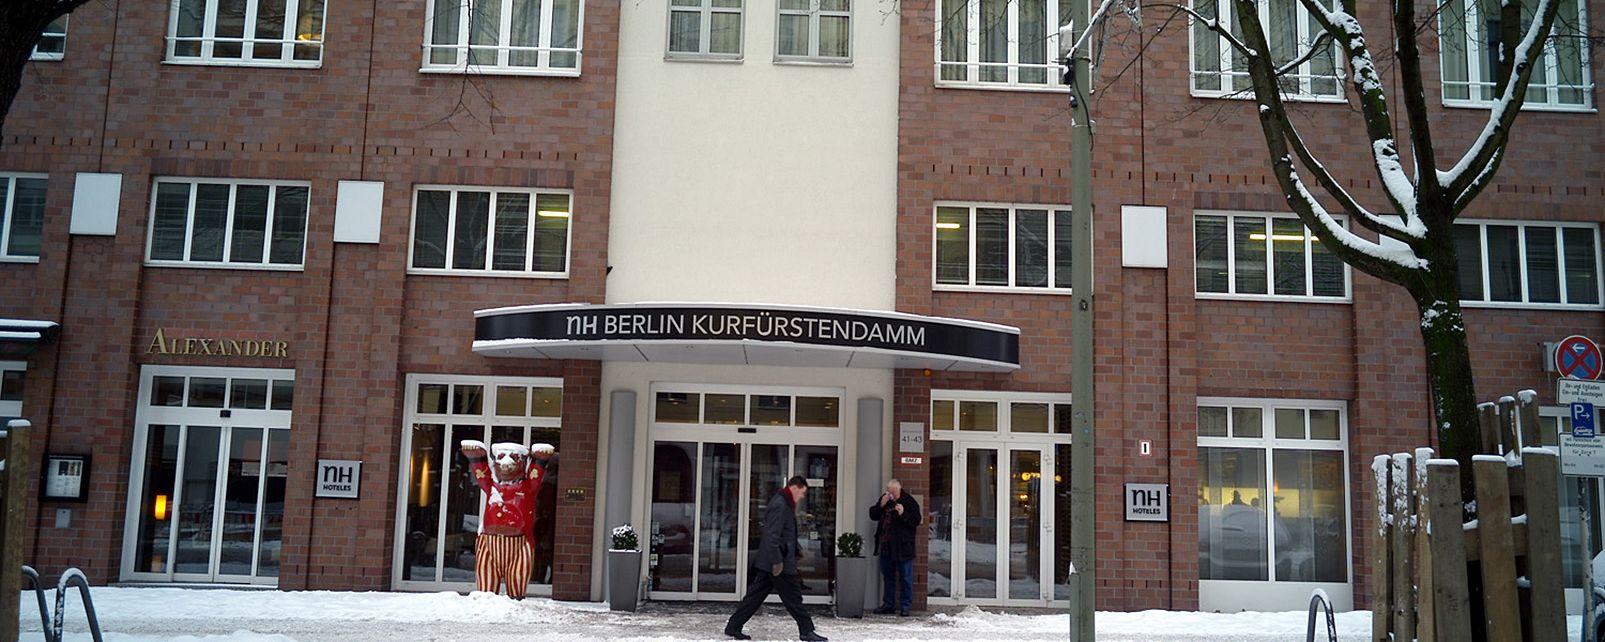 Hotel NH Berlin Kurfuerstendamm